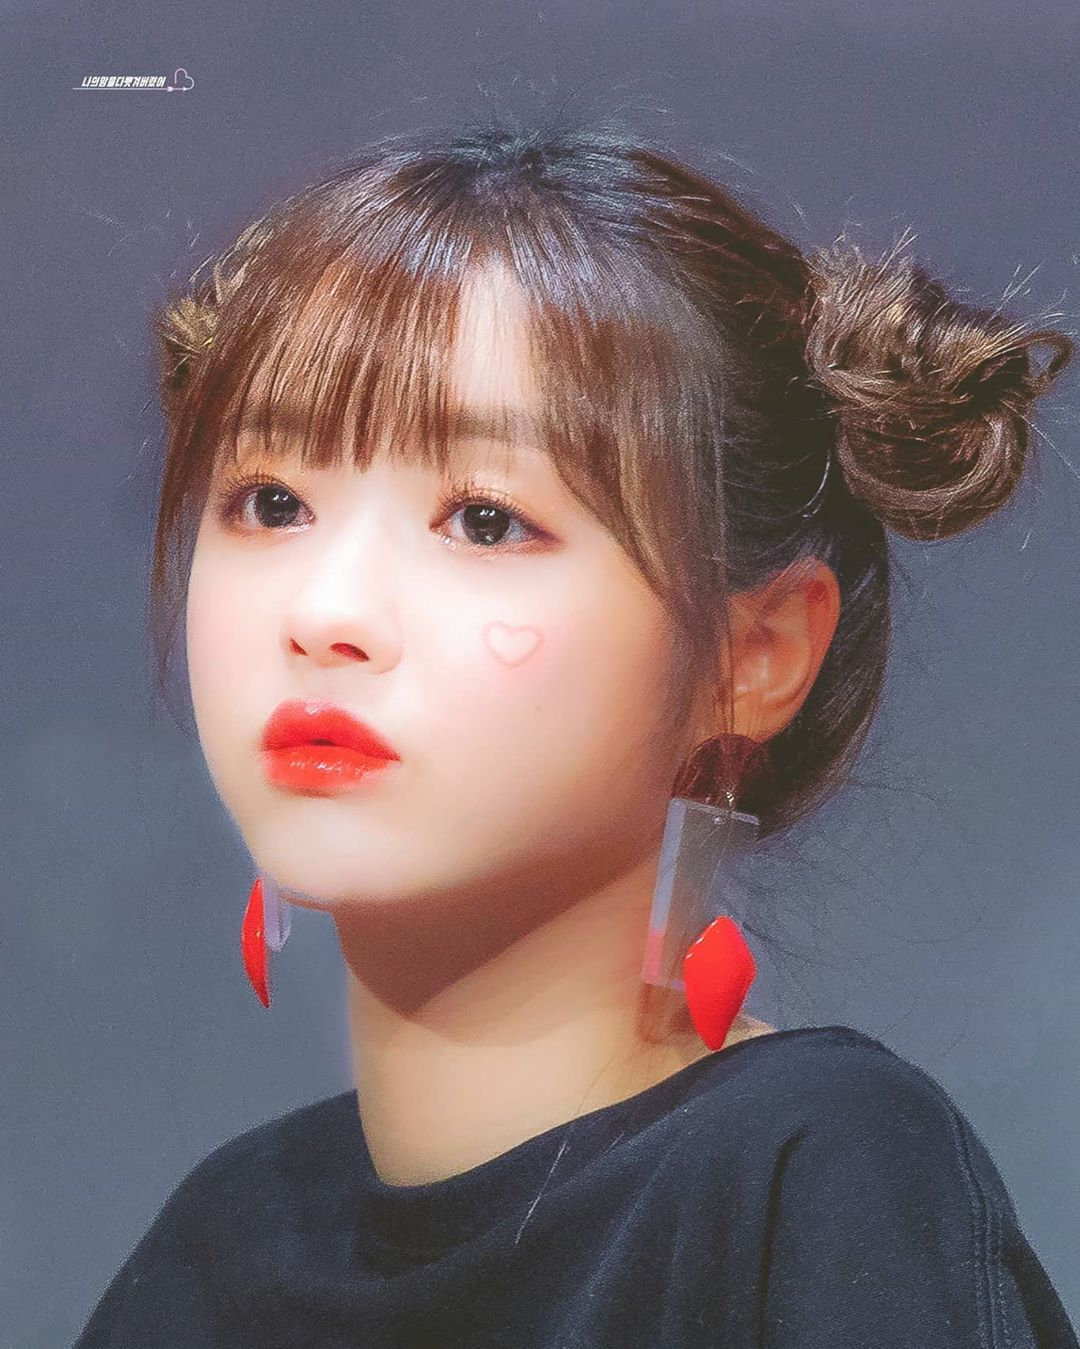 Ohmygirl Yooa Mongolia Divablie Added A Photo To Their Instagram Account Yooa Ohmygirl Ohmygirlyooa Oh My Girl Yooa My Girl Kpop Girls